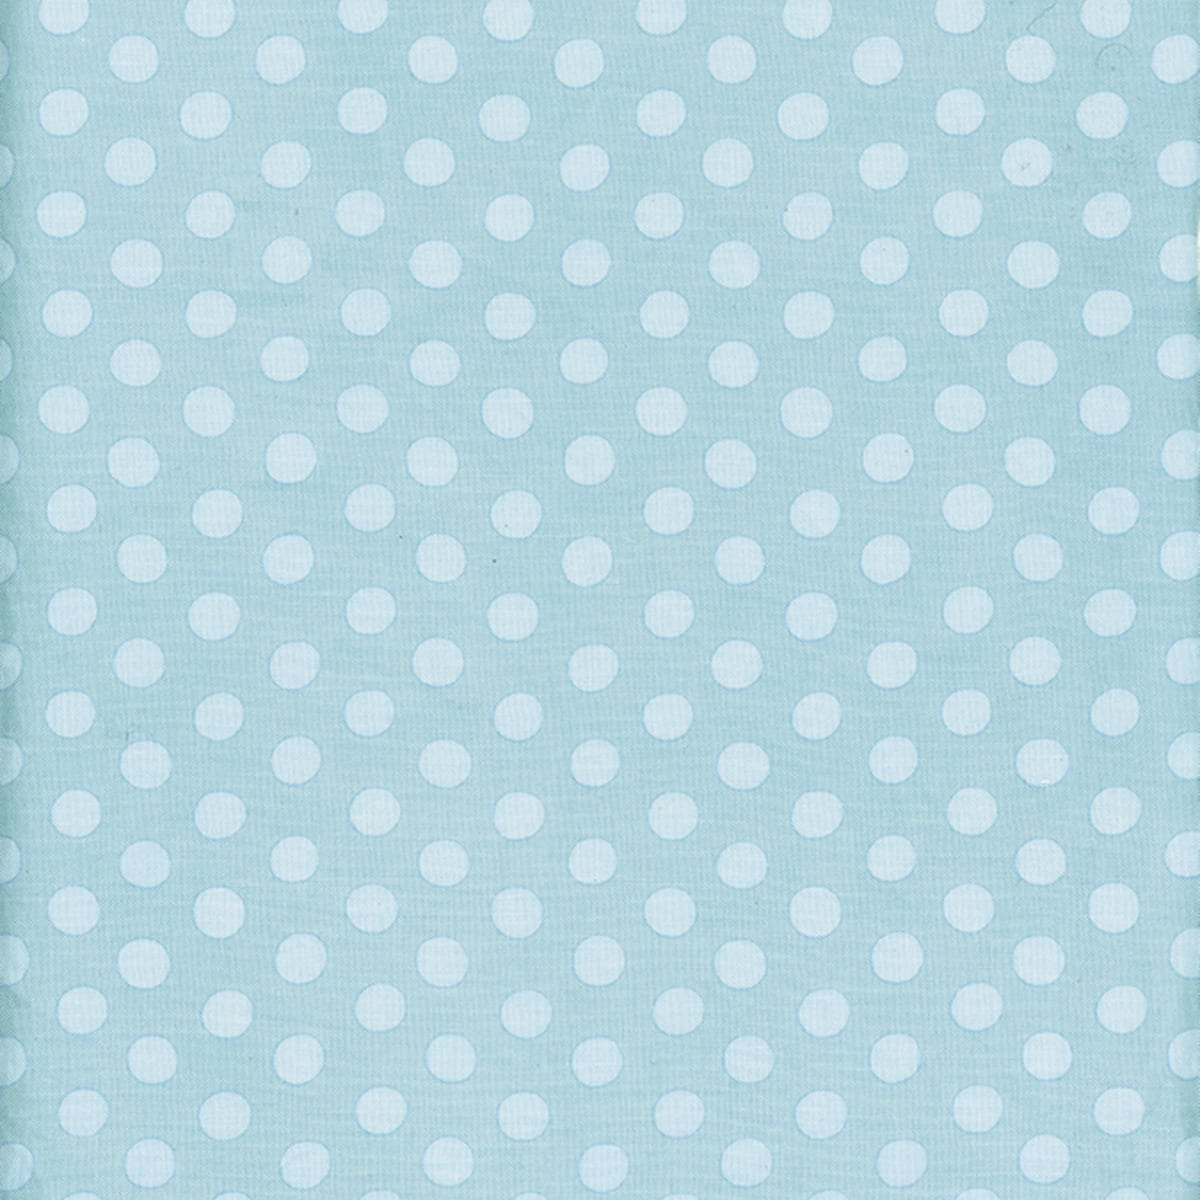 Grey GP70 Fabric by Kaffe Fassett Spot